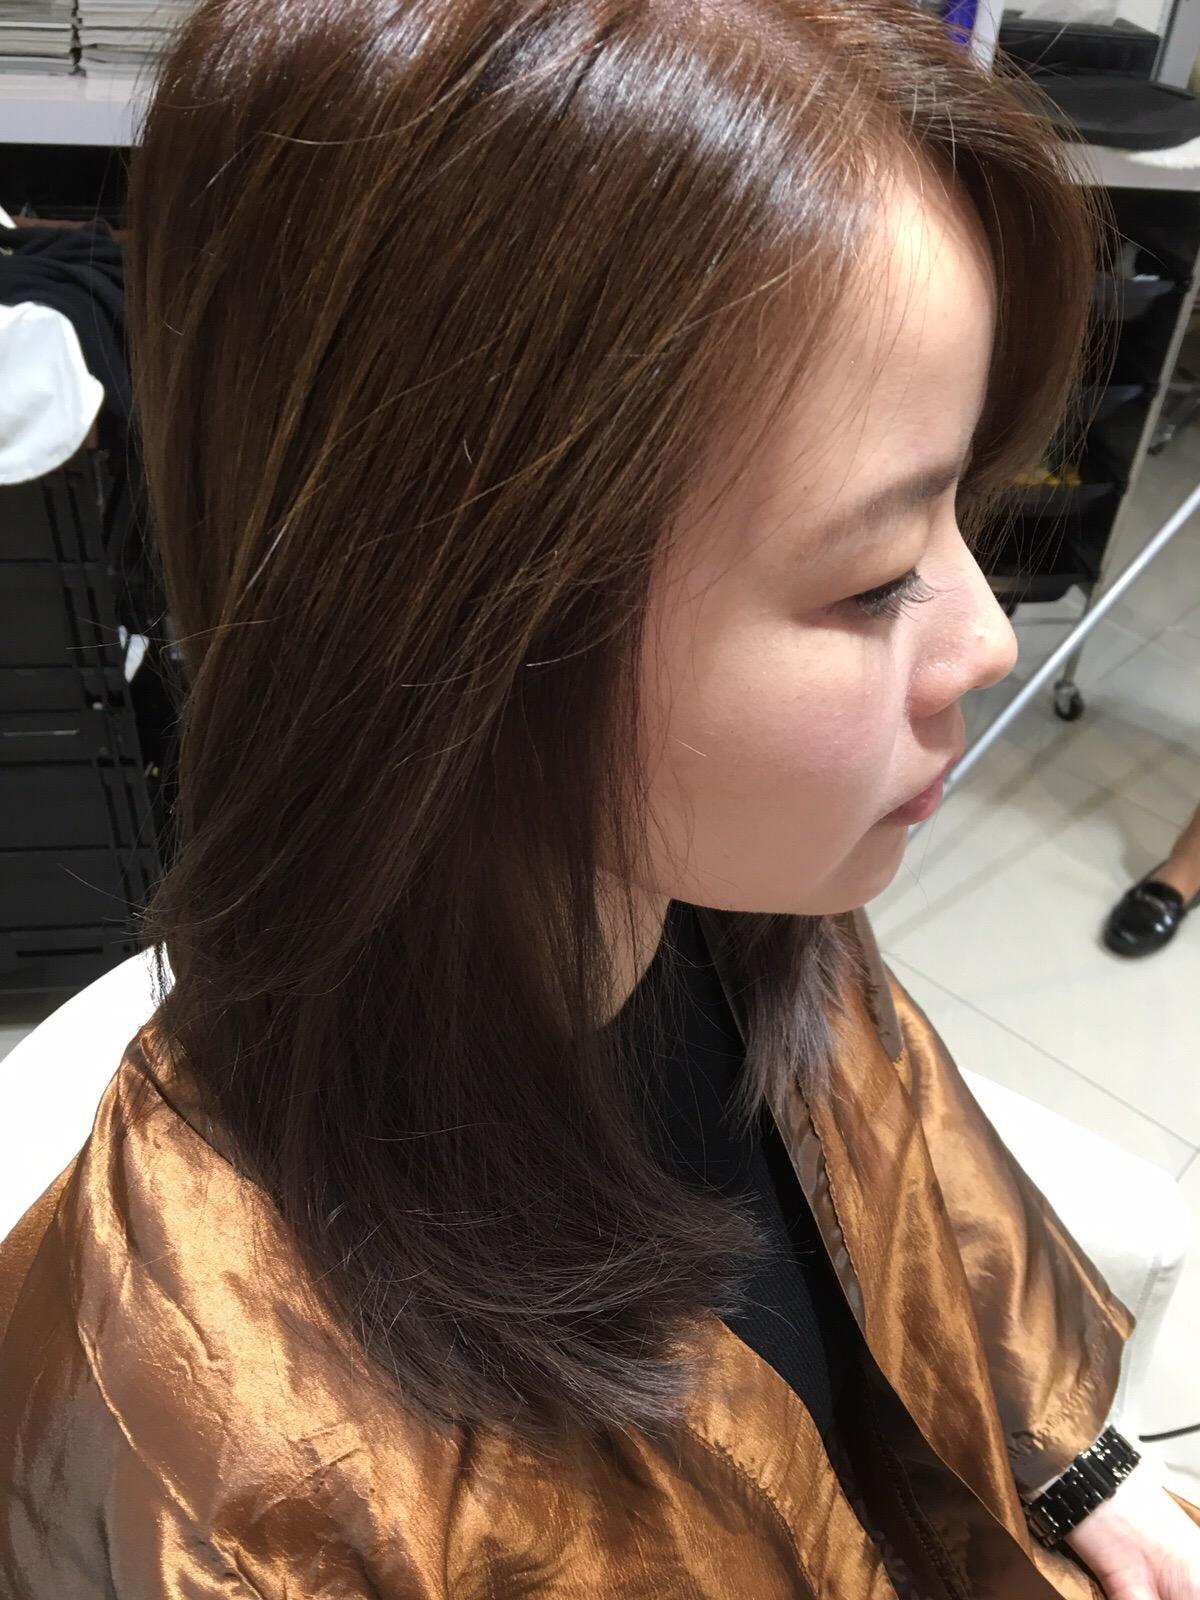 Kenjo Korean Hair Salon The Best Korean Hair Salon That You